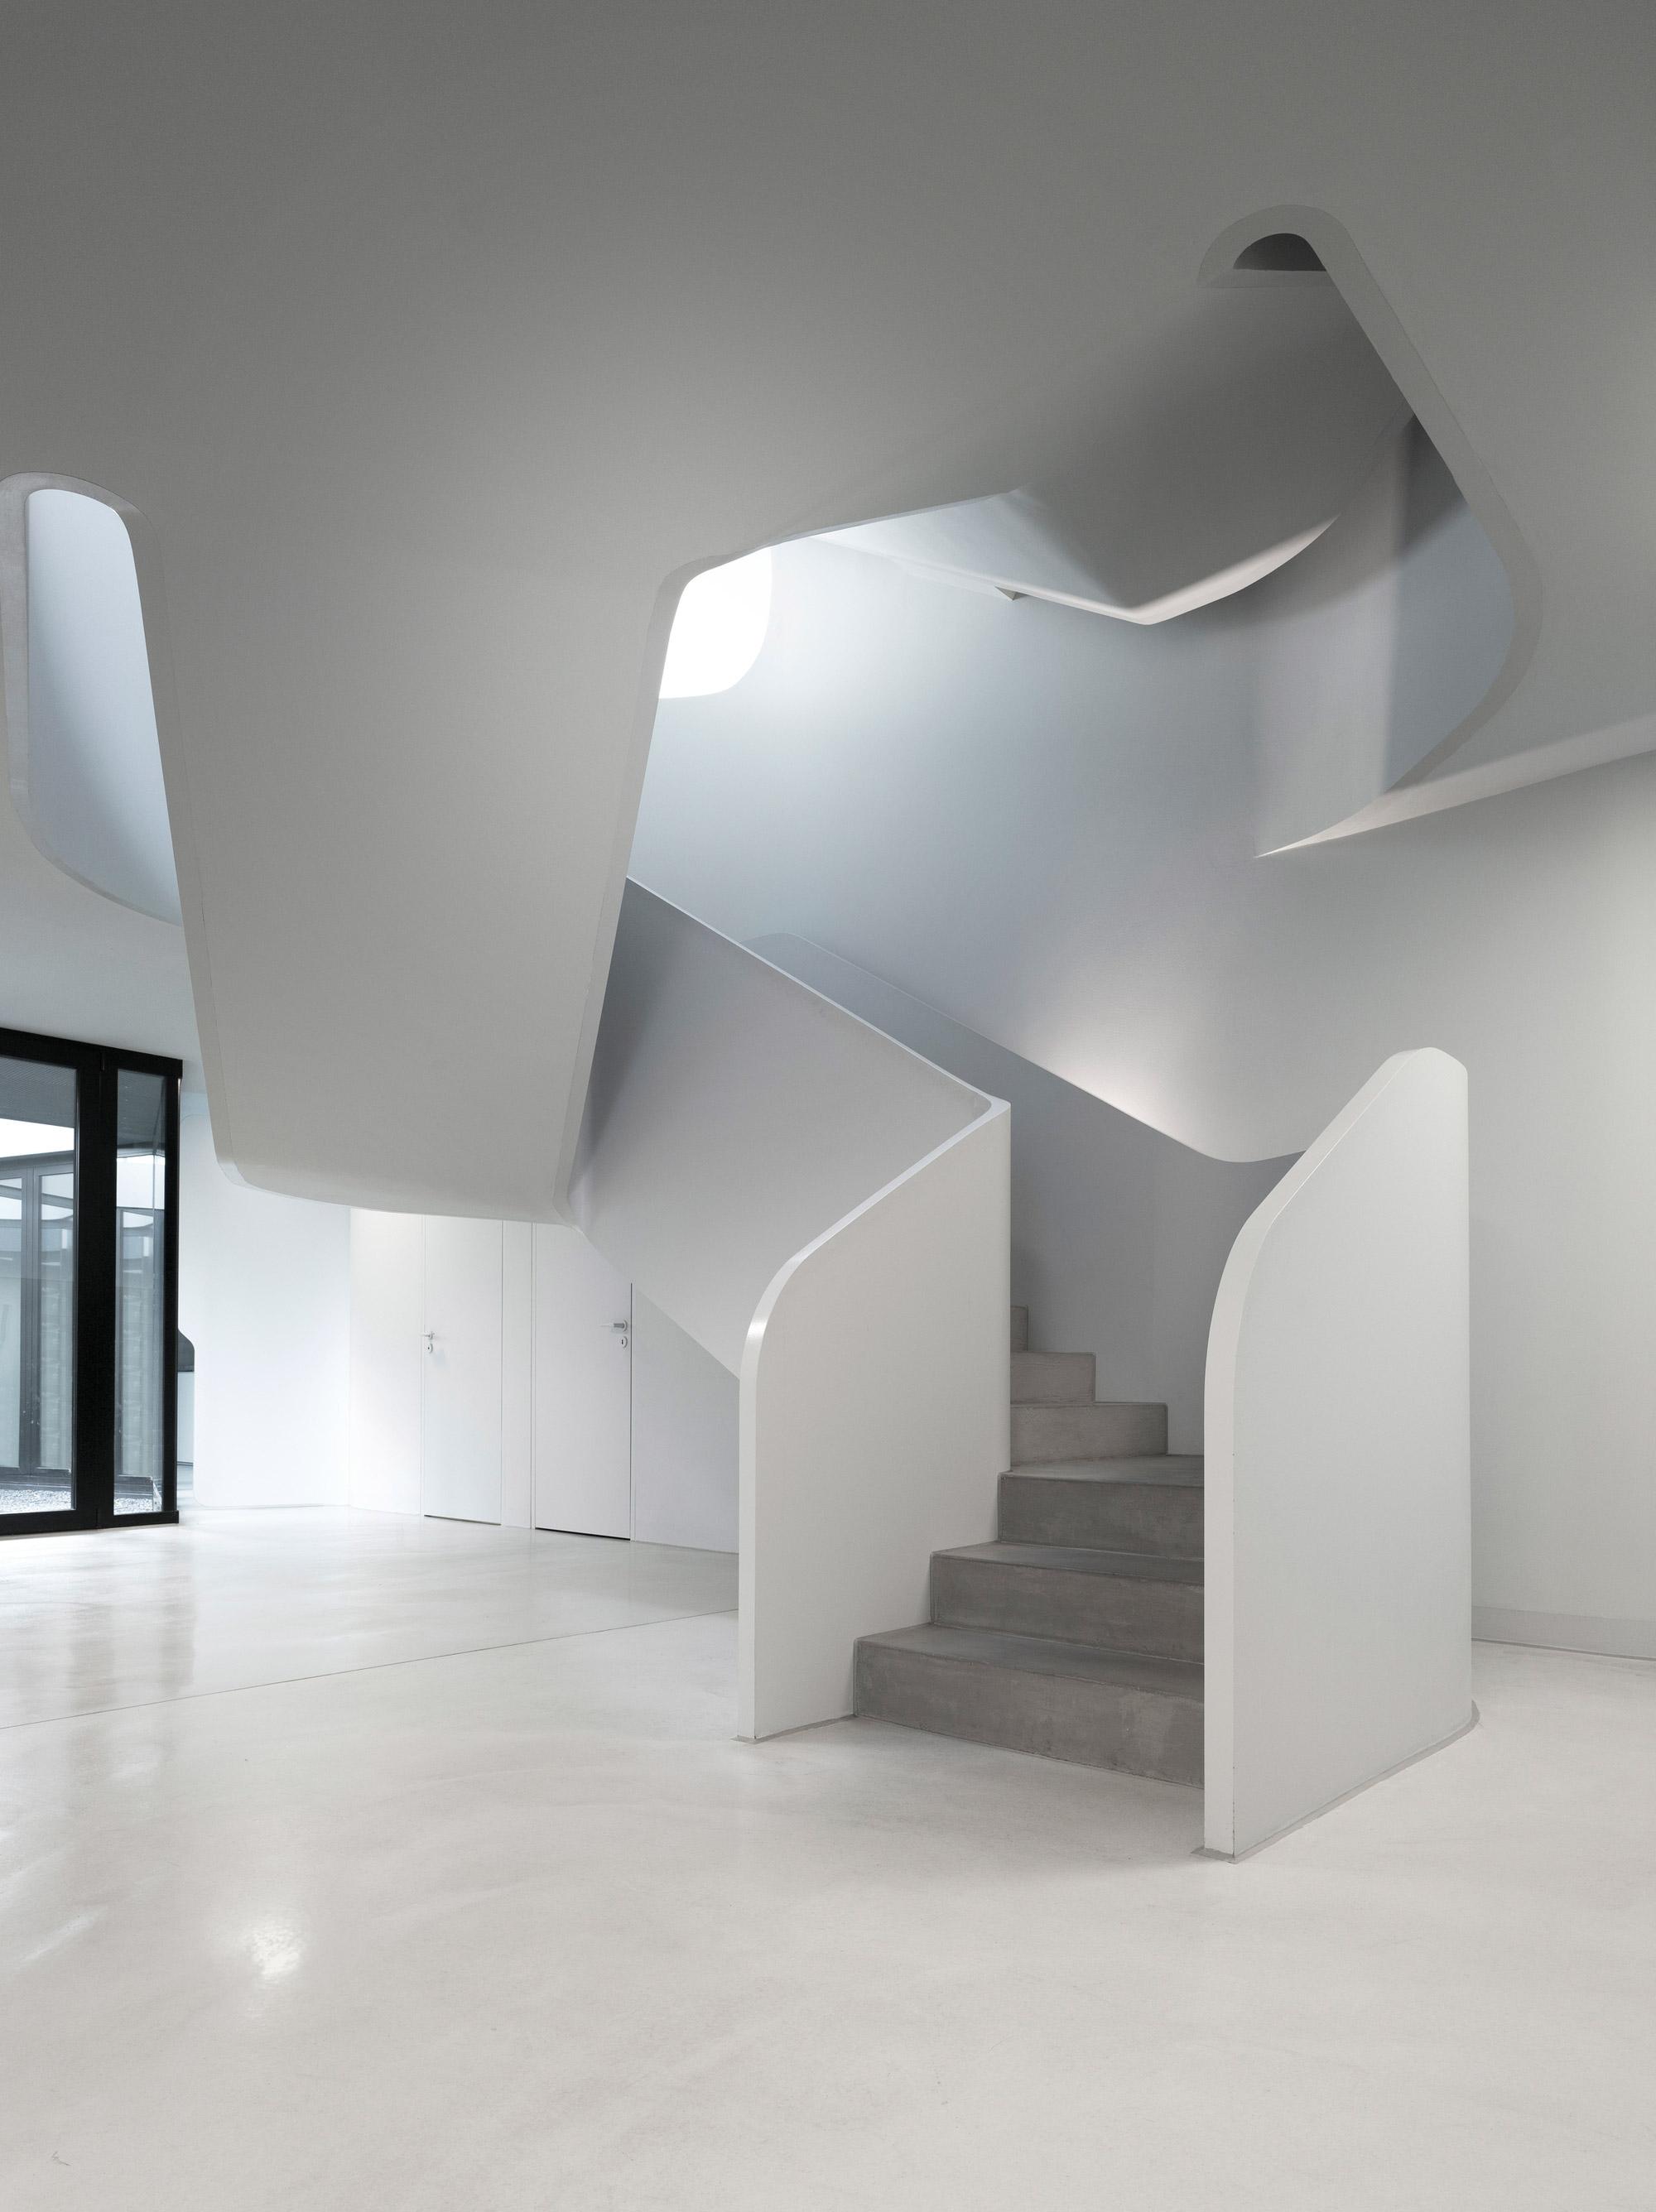 OLS House / J. MAYER H Architects